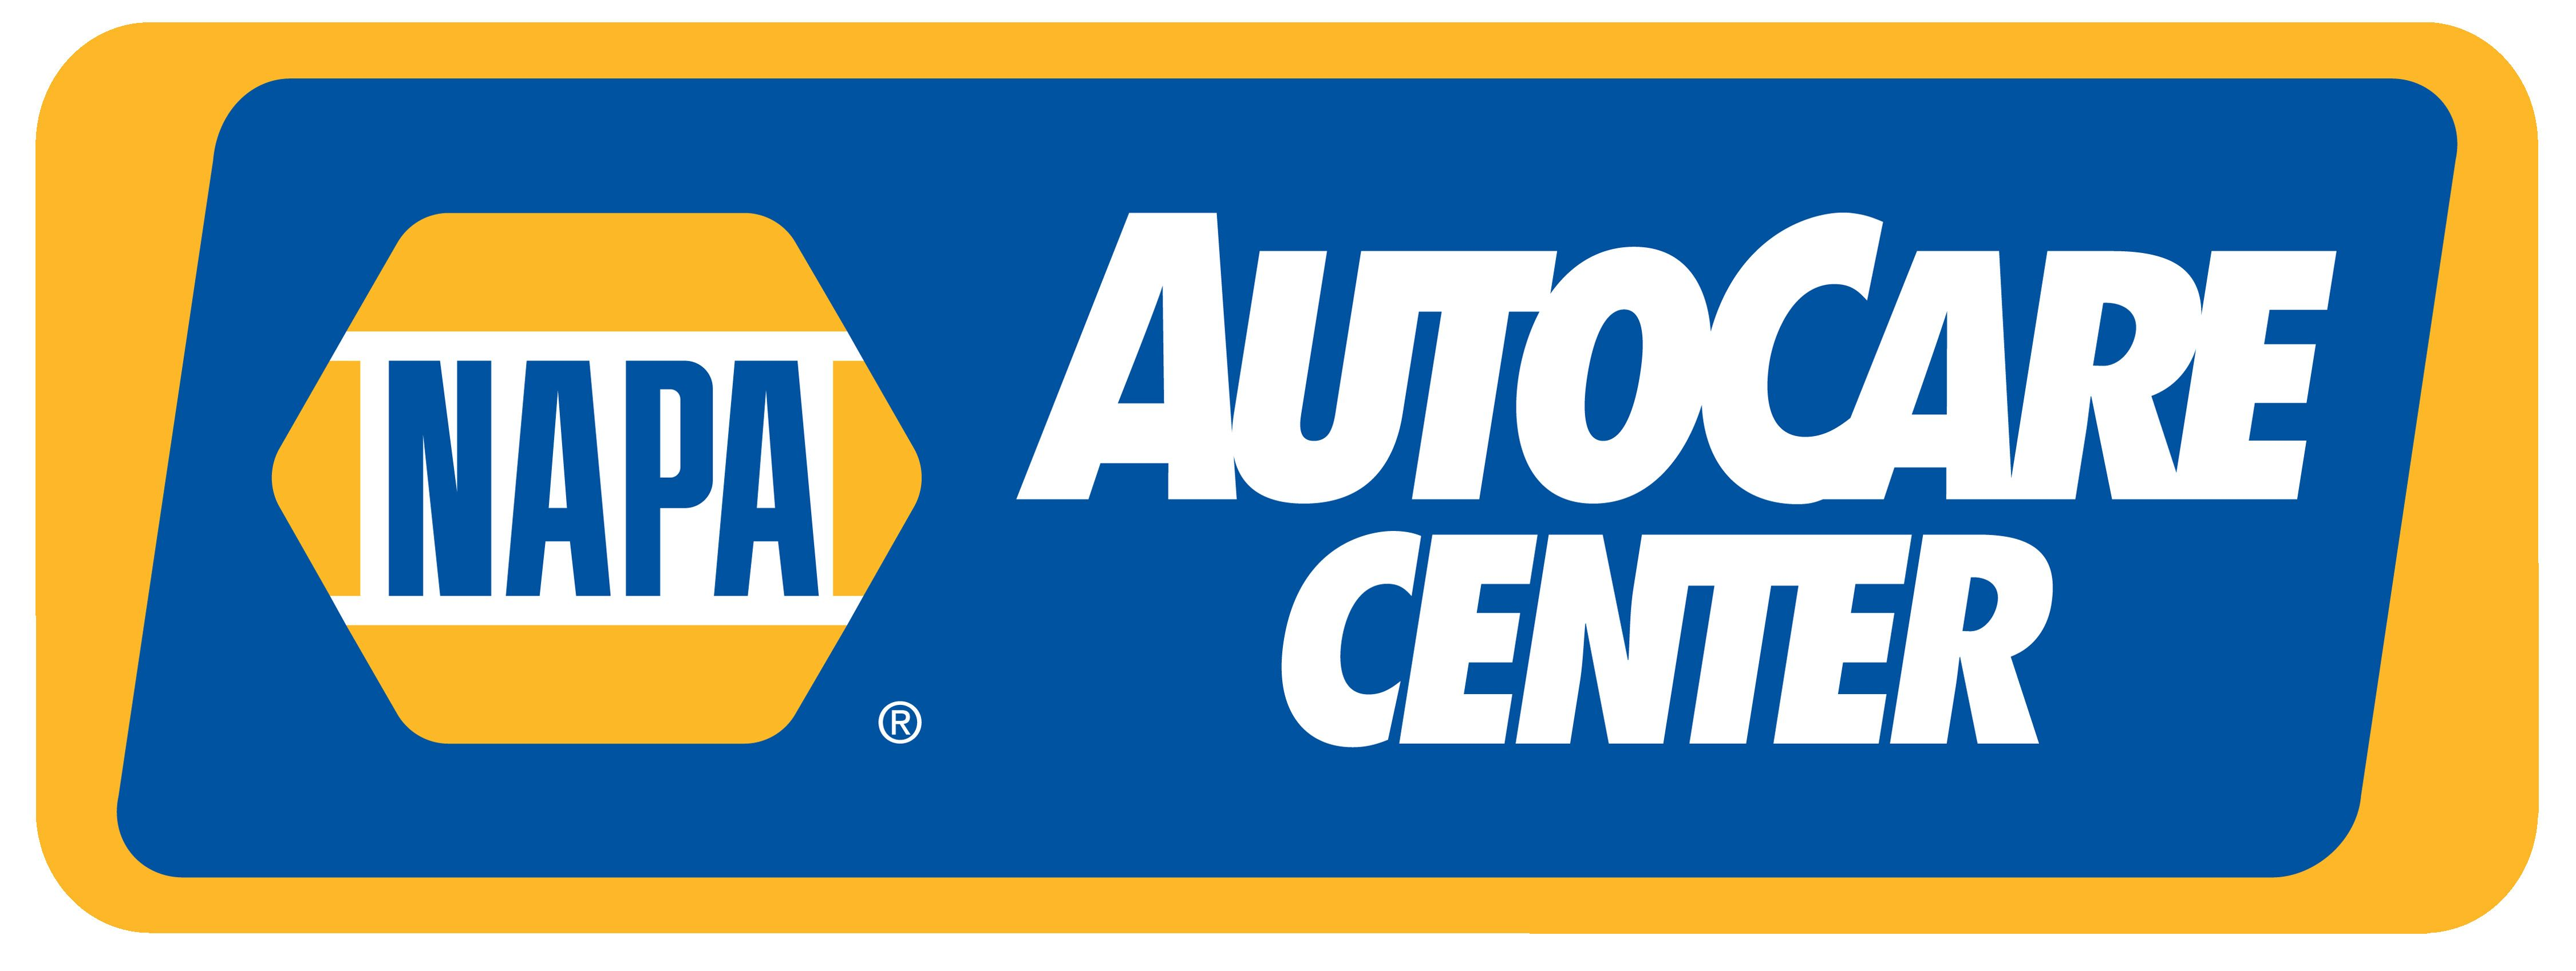 Napa Auto Care Center Car Care Auto Repair Automotive Repair Shop